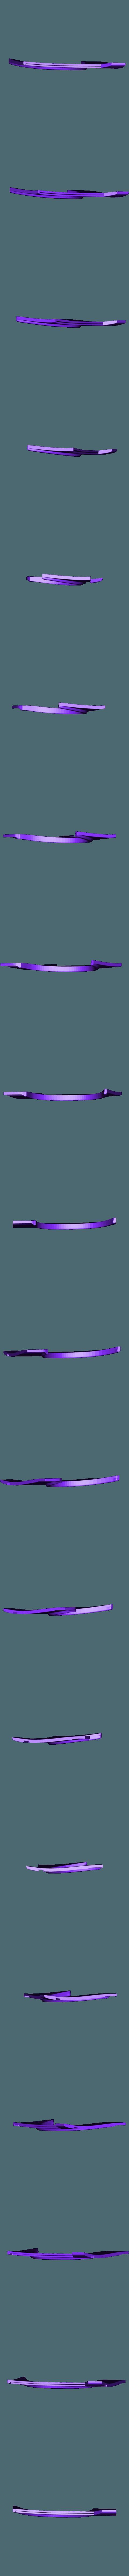 front_wing_L.STL Download STL file Lada Niva  • 3D printing template, serega1337